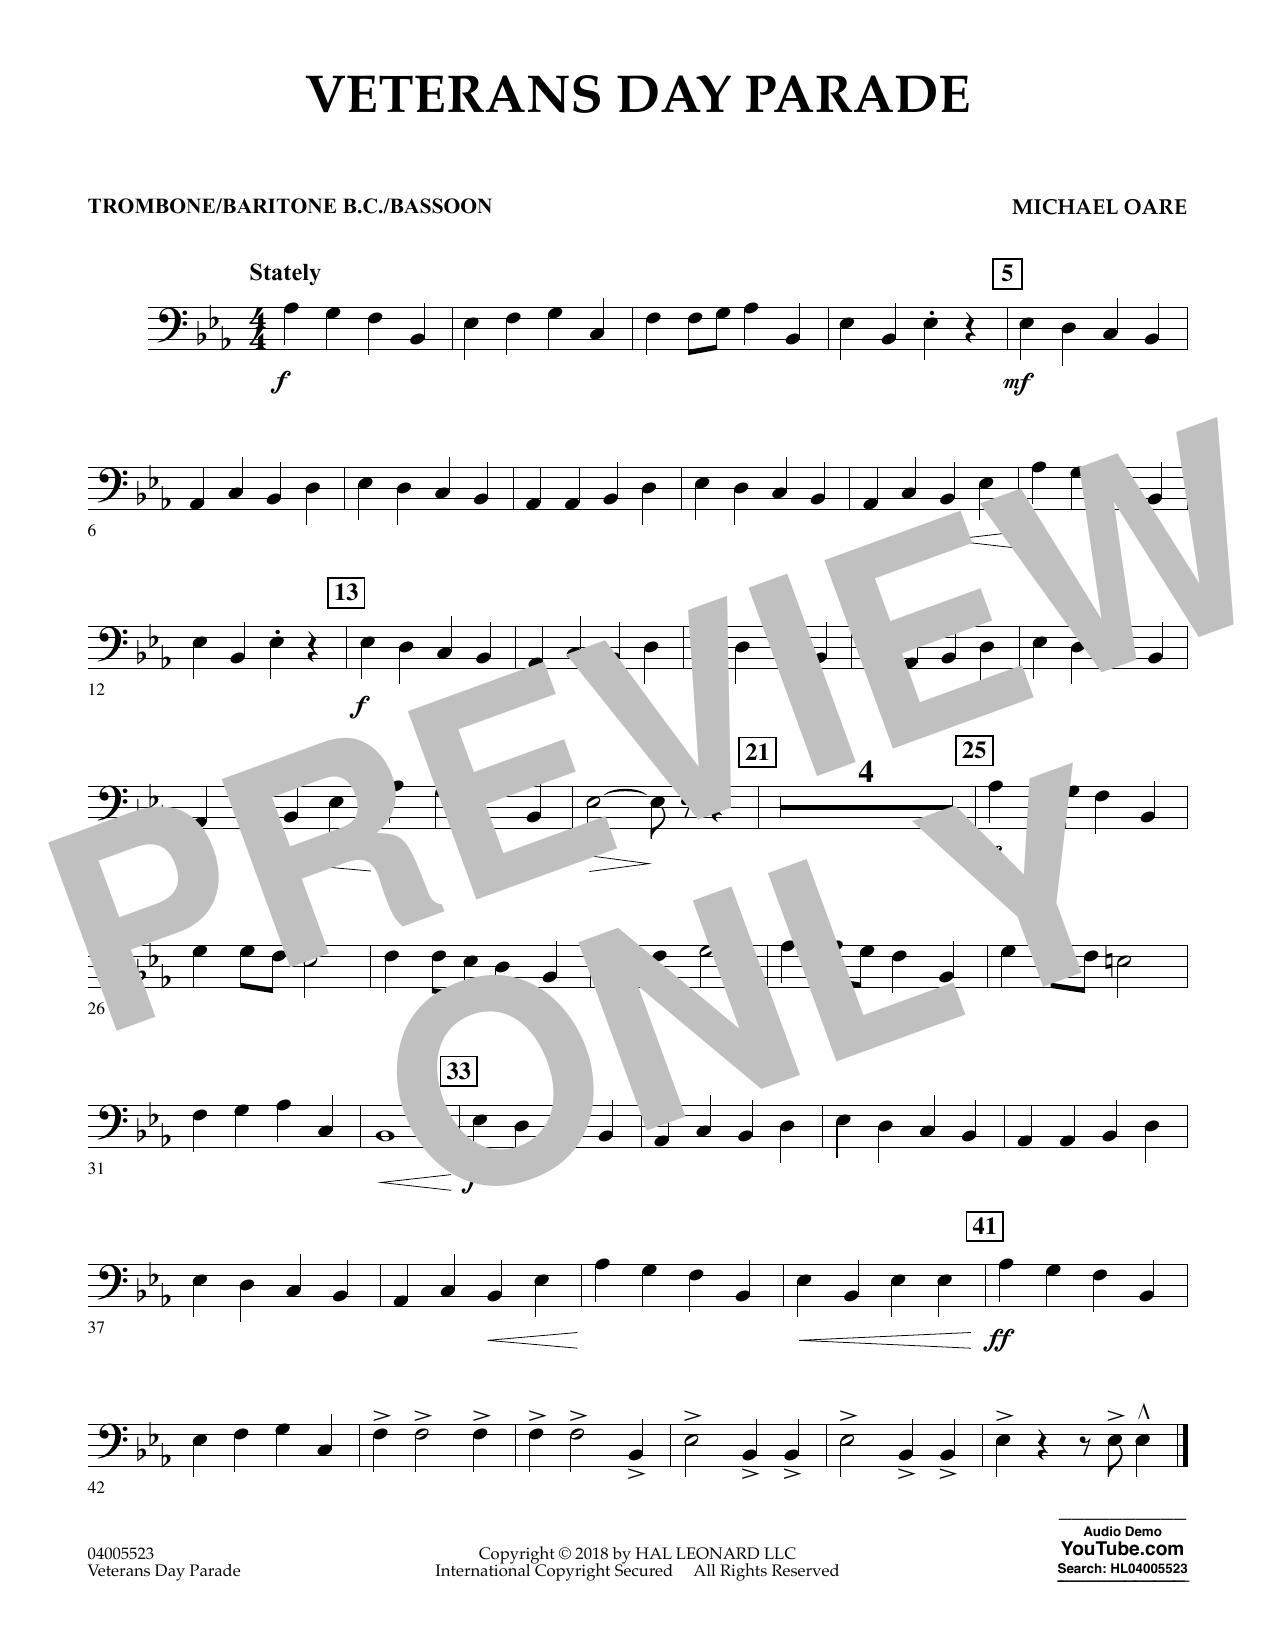 Veterans Day Parade - Trombone/Baritone B.C./Bassoon (Concert Band)